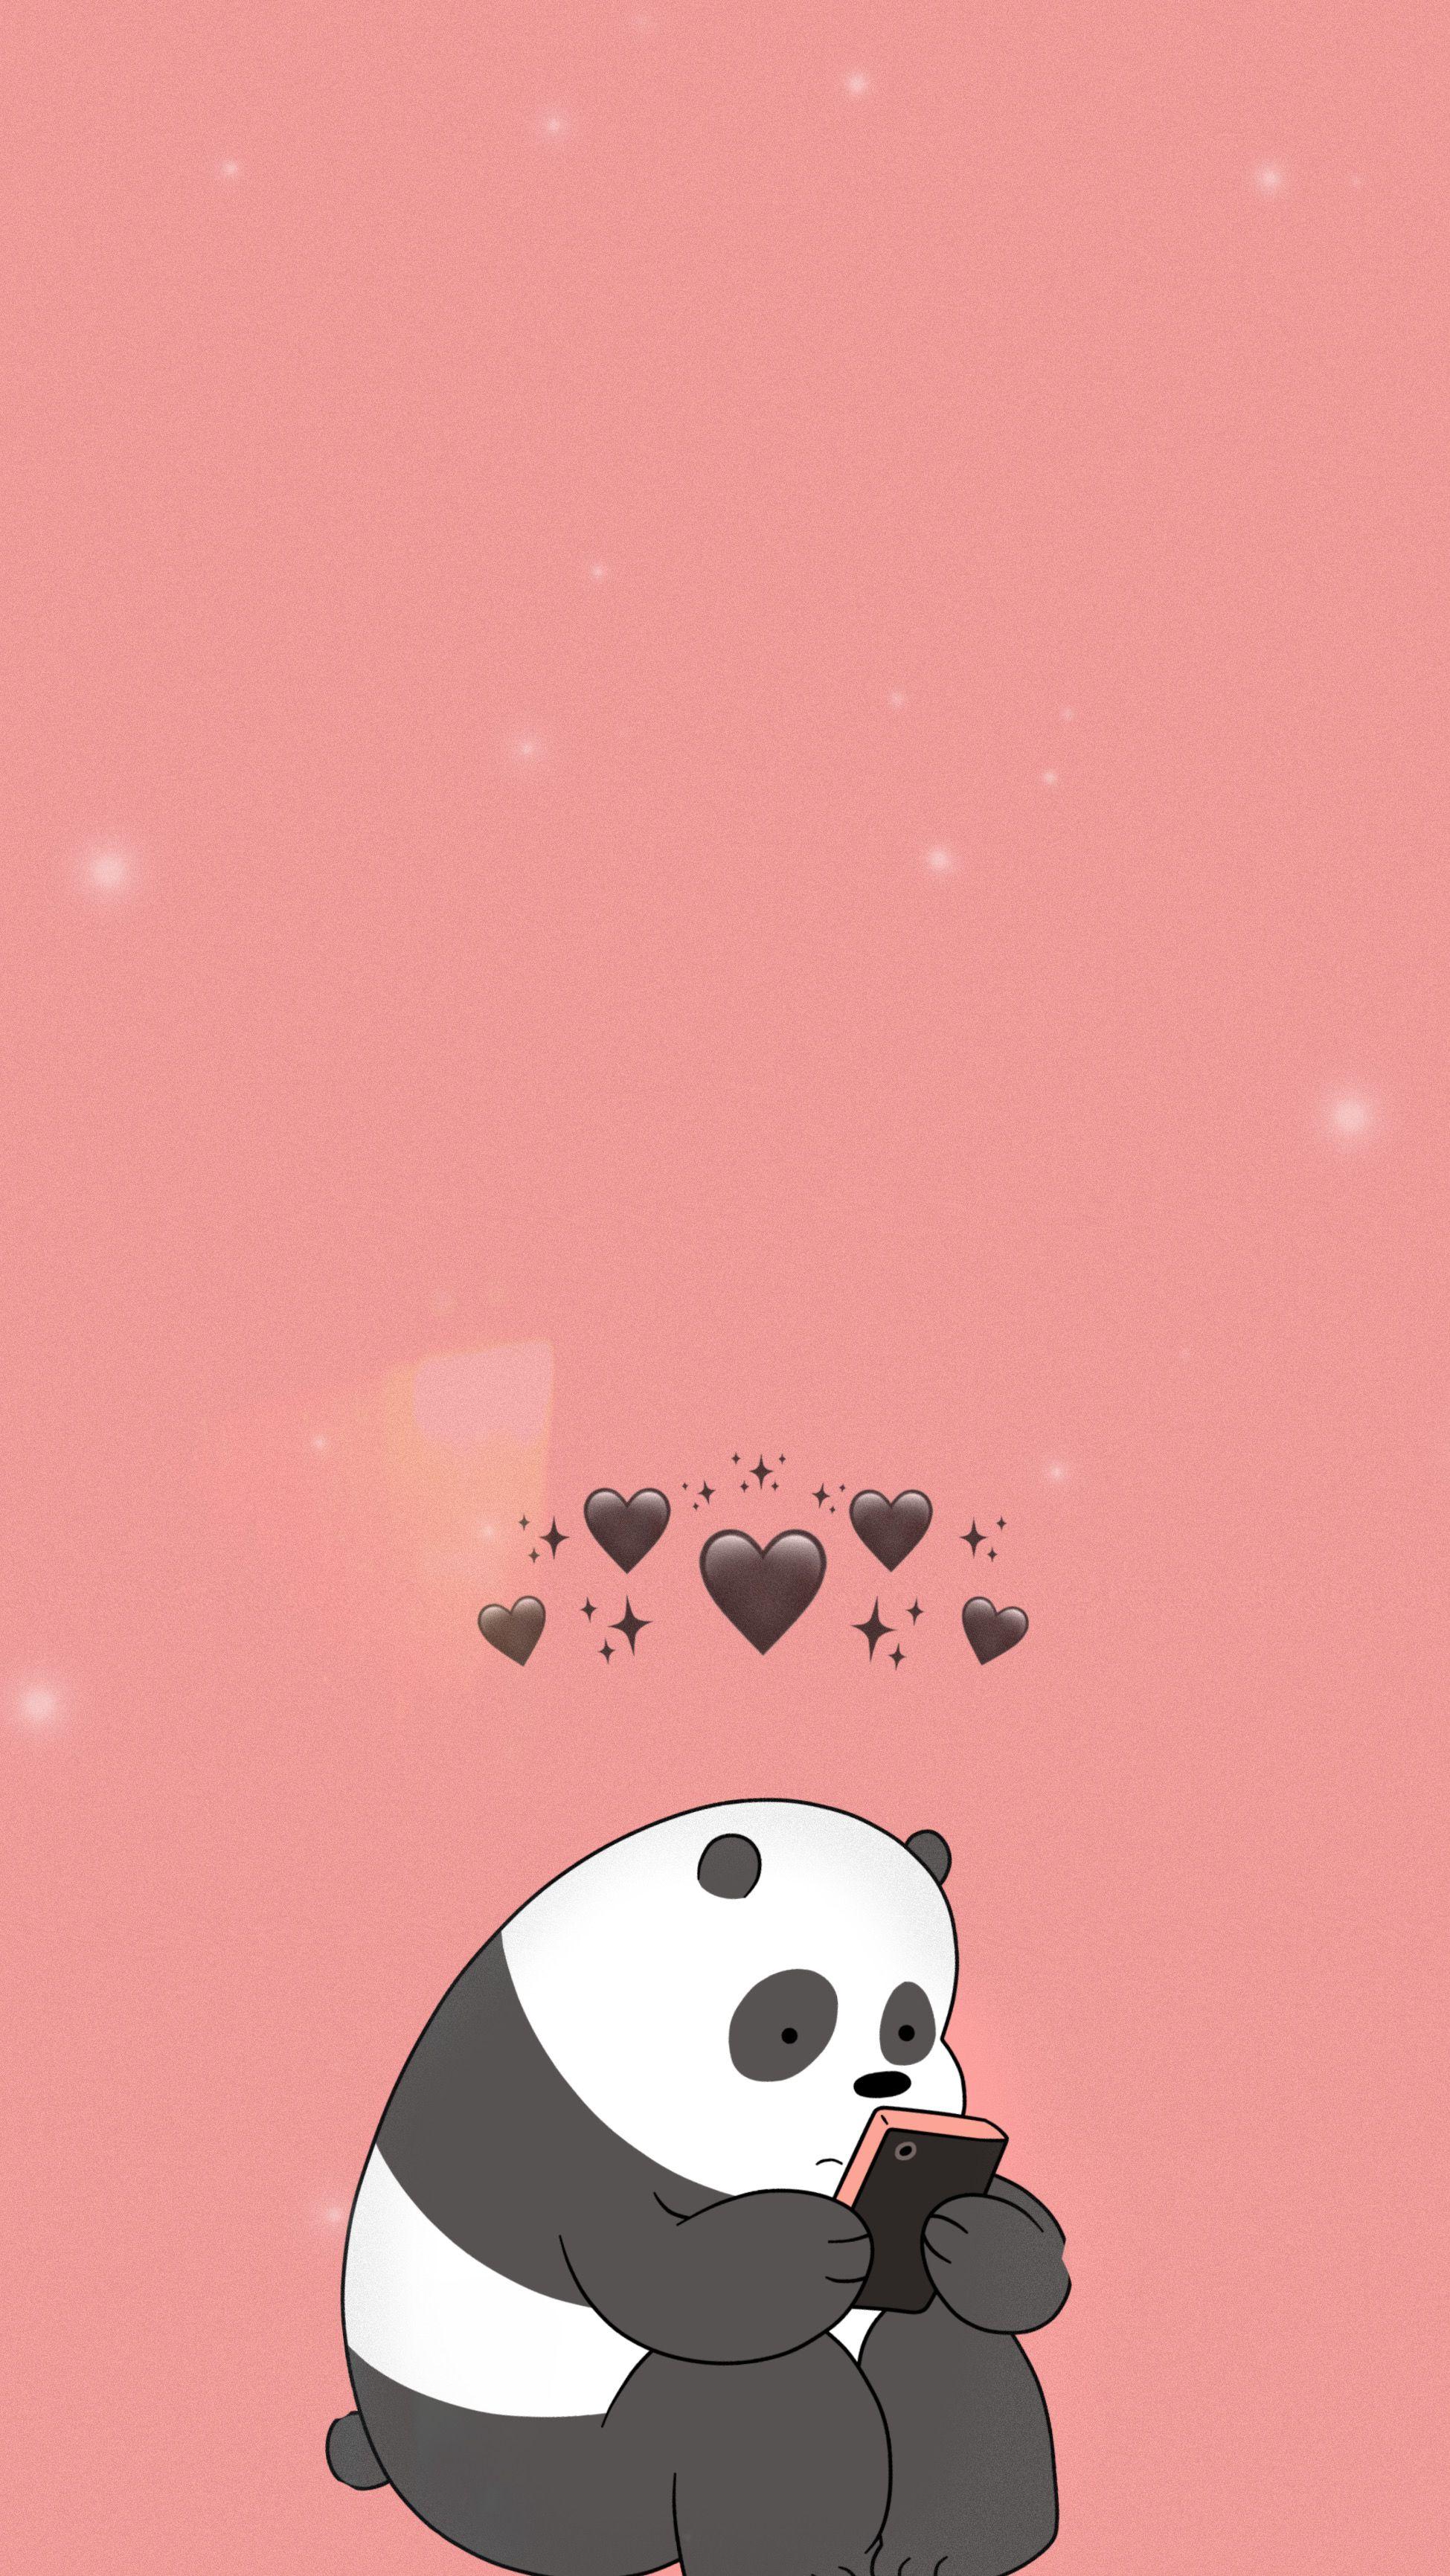 Wallpaper Panda Lucu Pink